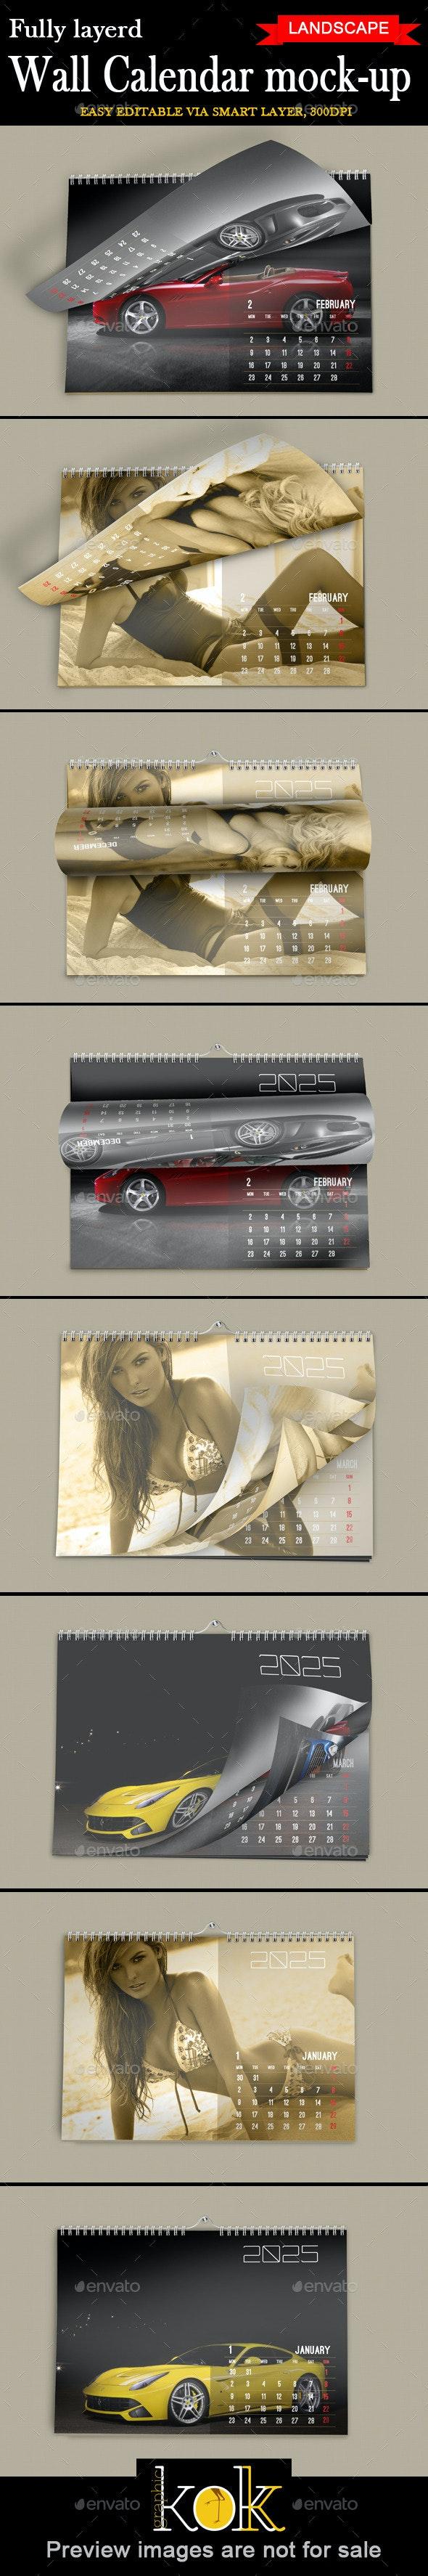 Wall Calendar Mockup Landscape Model - Product Mock-Ups Graphics